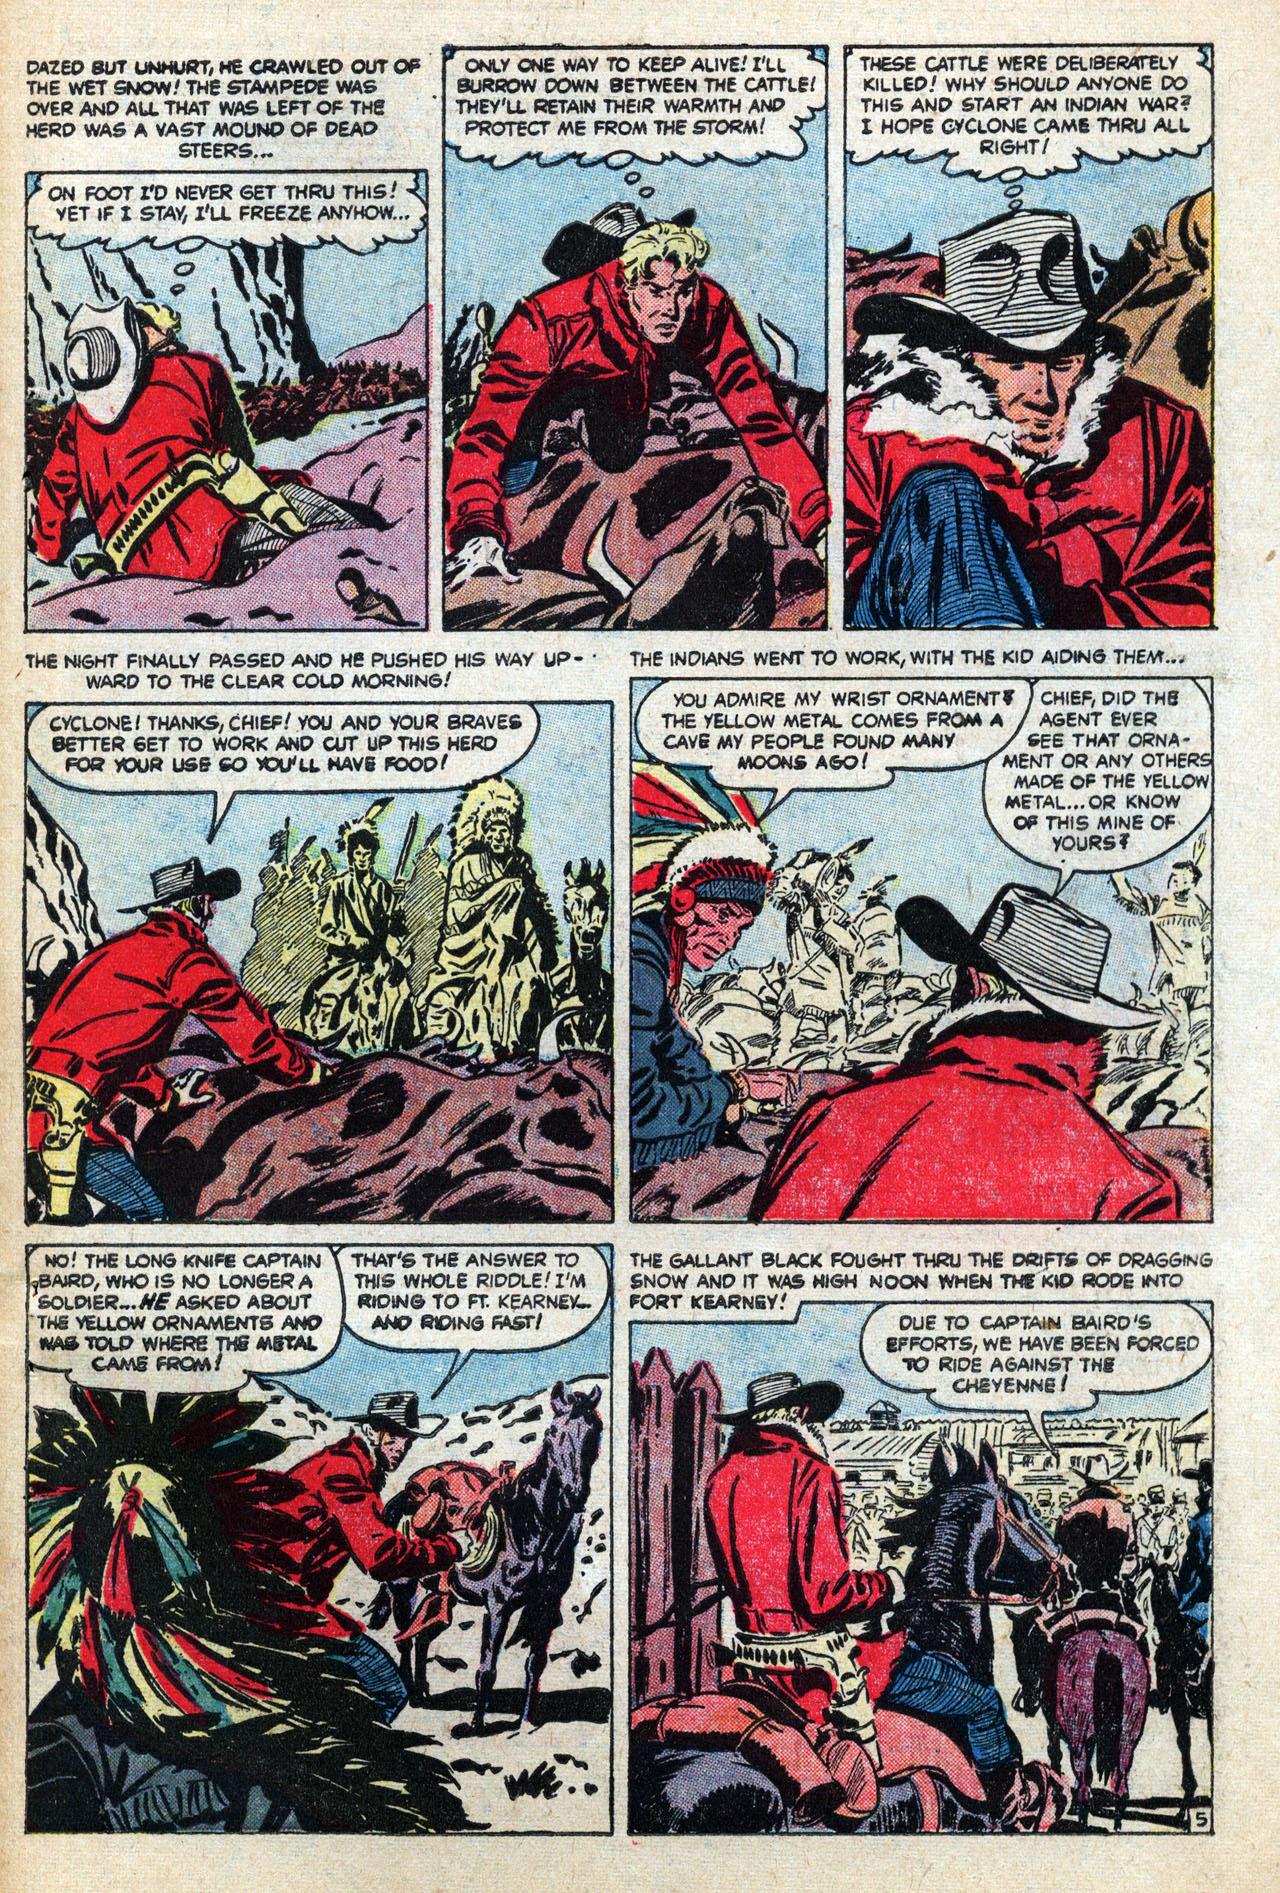 Read online Two-Gun Kid comic -  Issue #27 - 31